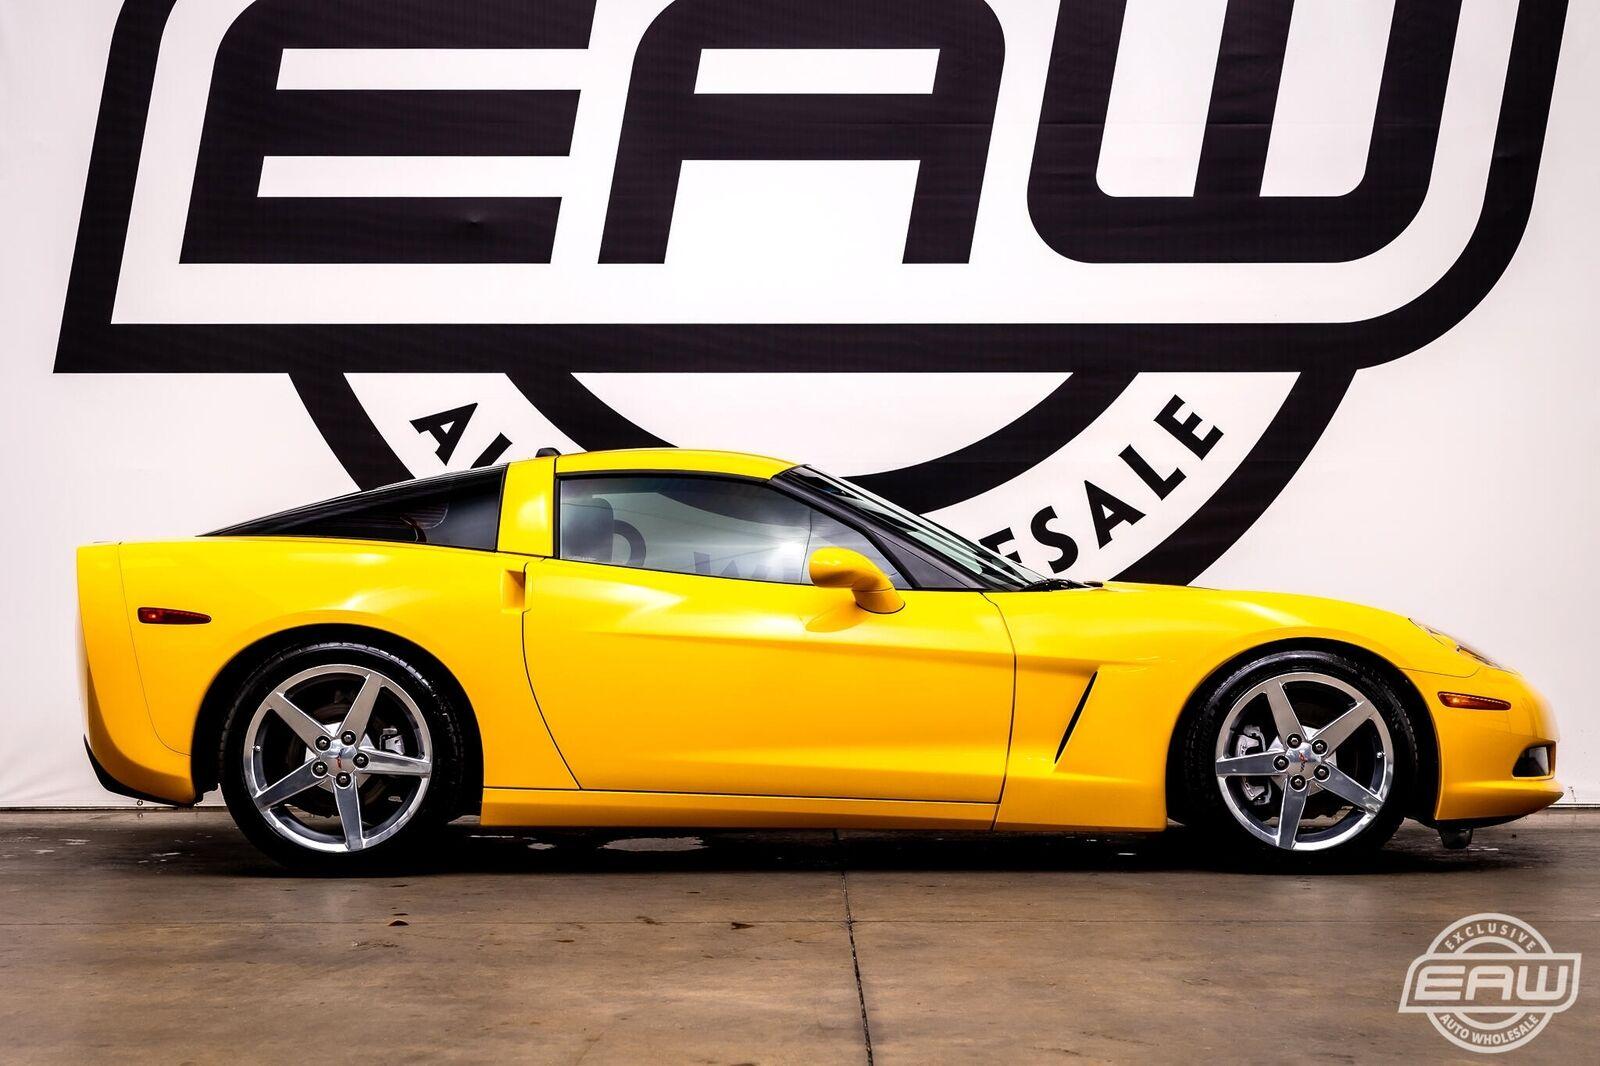 2005 Yellow Chevrolet Corvette Coupe  | C6 Corvette Photo 9